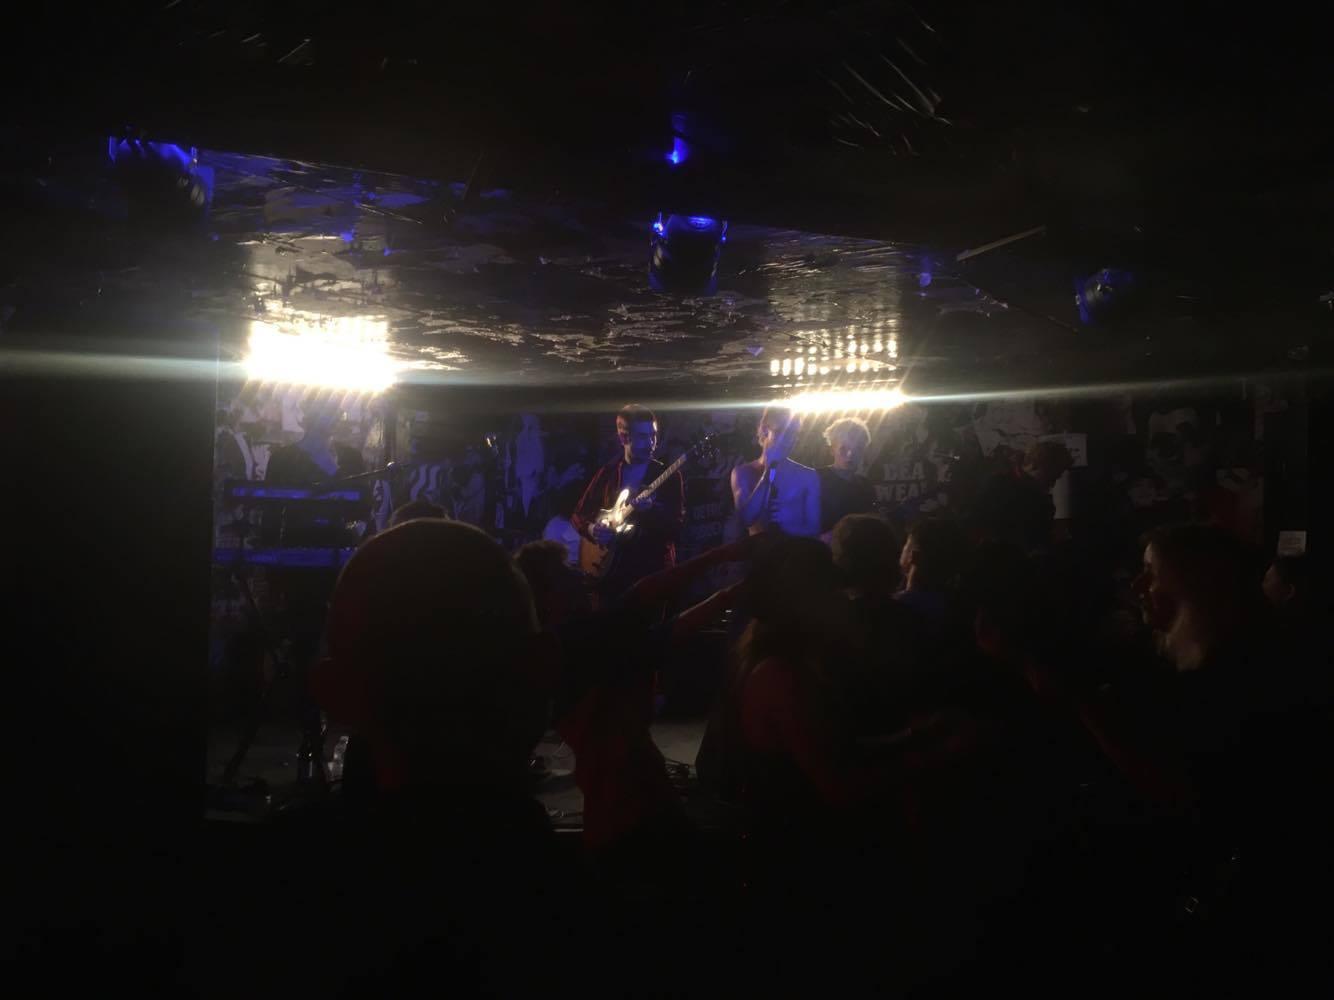 HMLTD live at ThinkTank